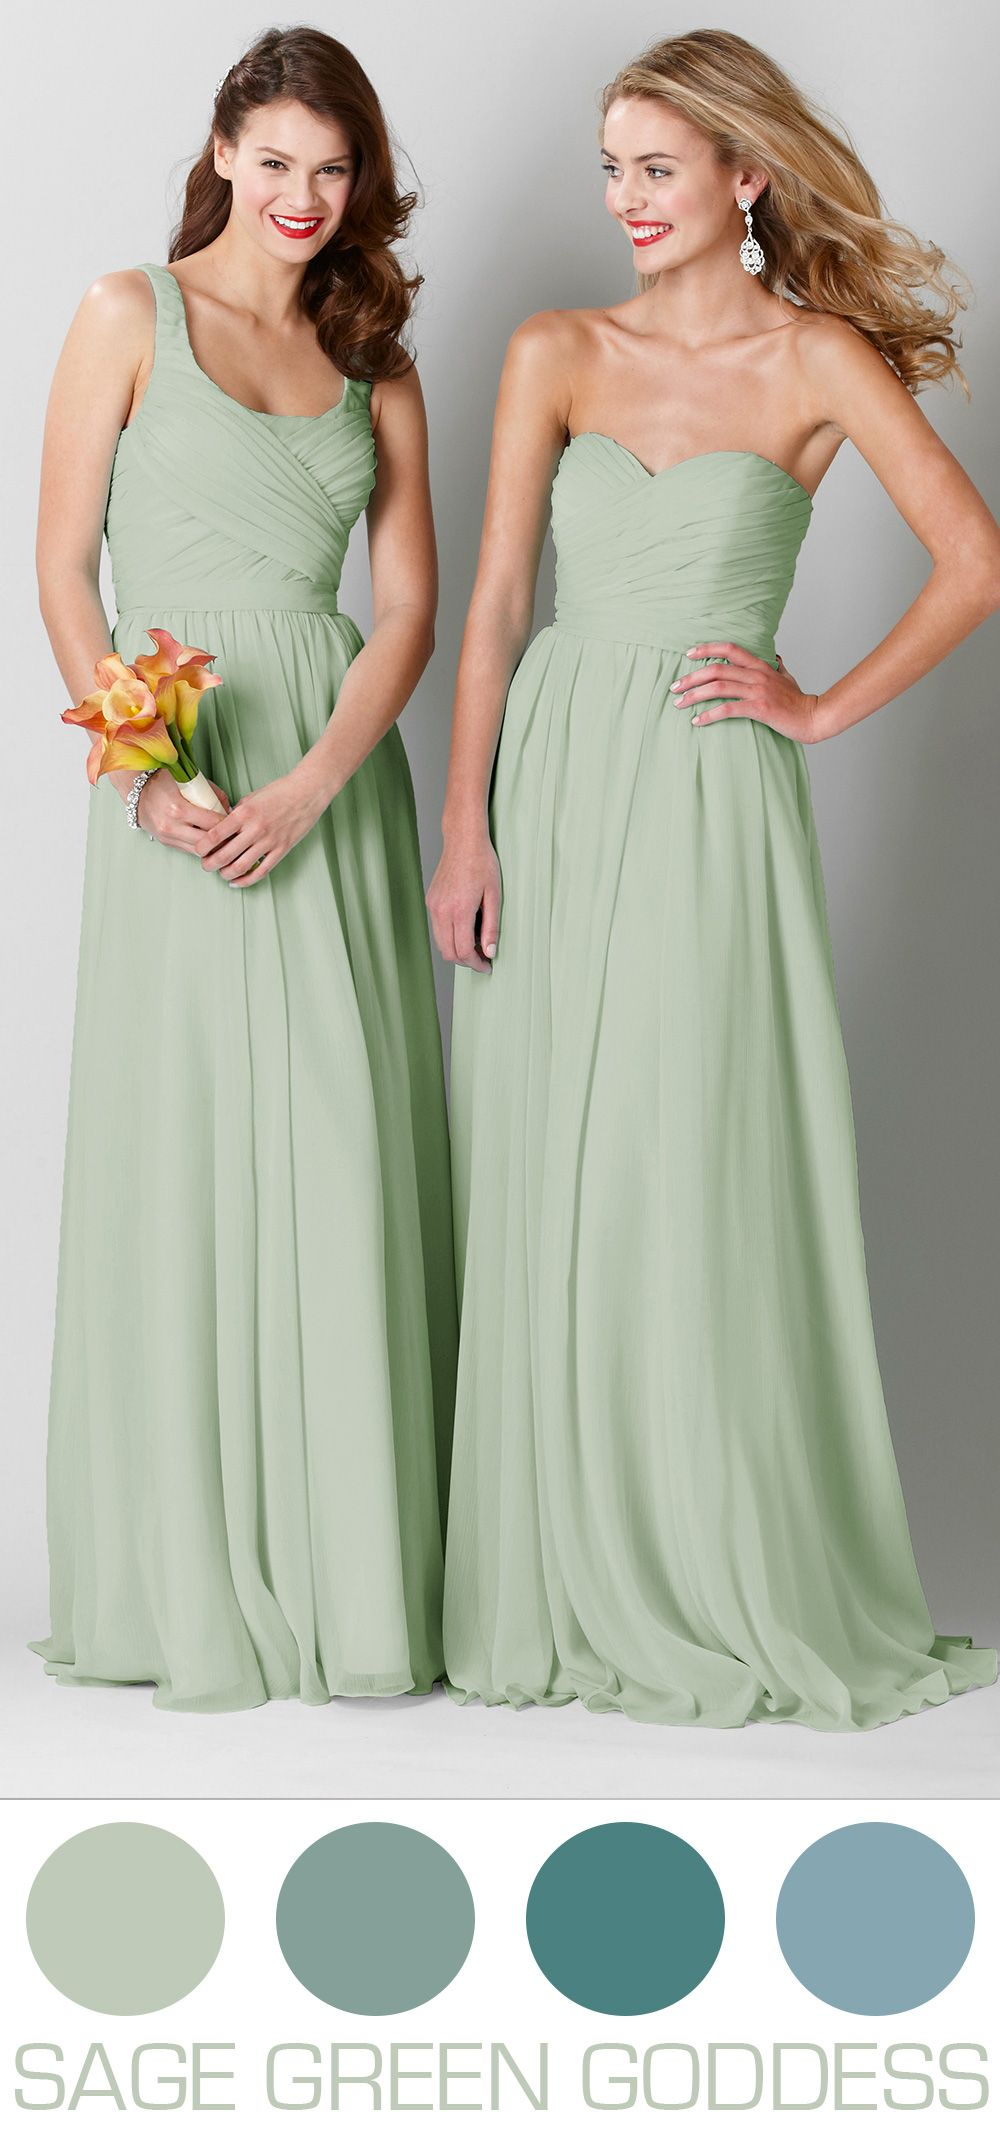 e0eab0d6b3 ... sage green wedding inspiration featuring long chiffon bridesmaid dresses  from kennedy blue ...